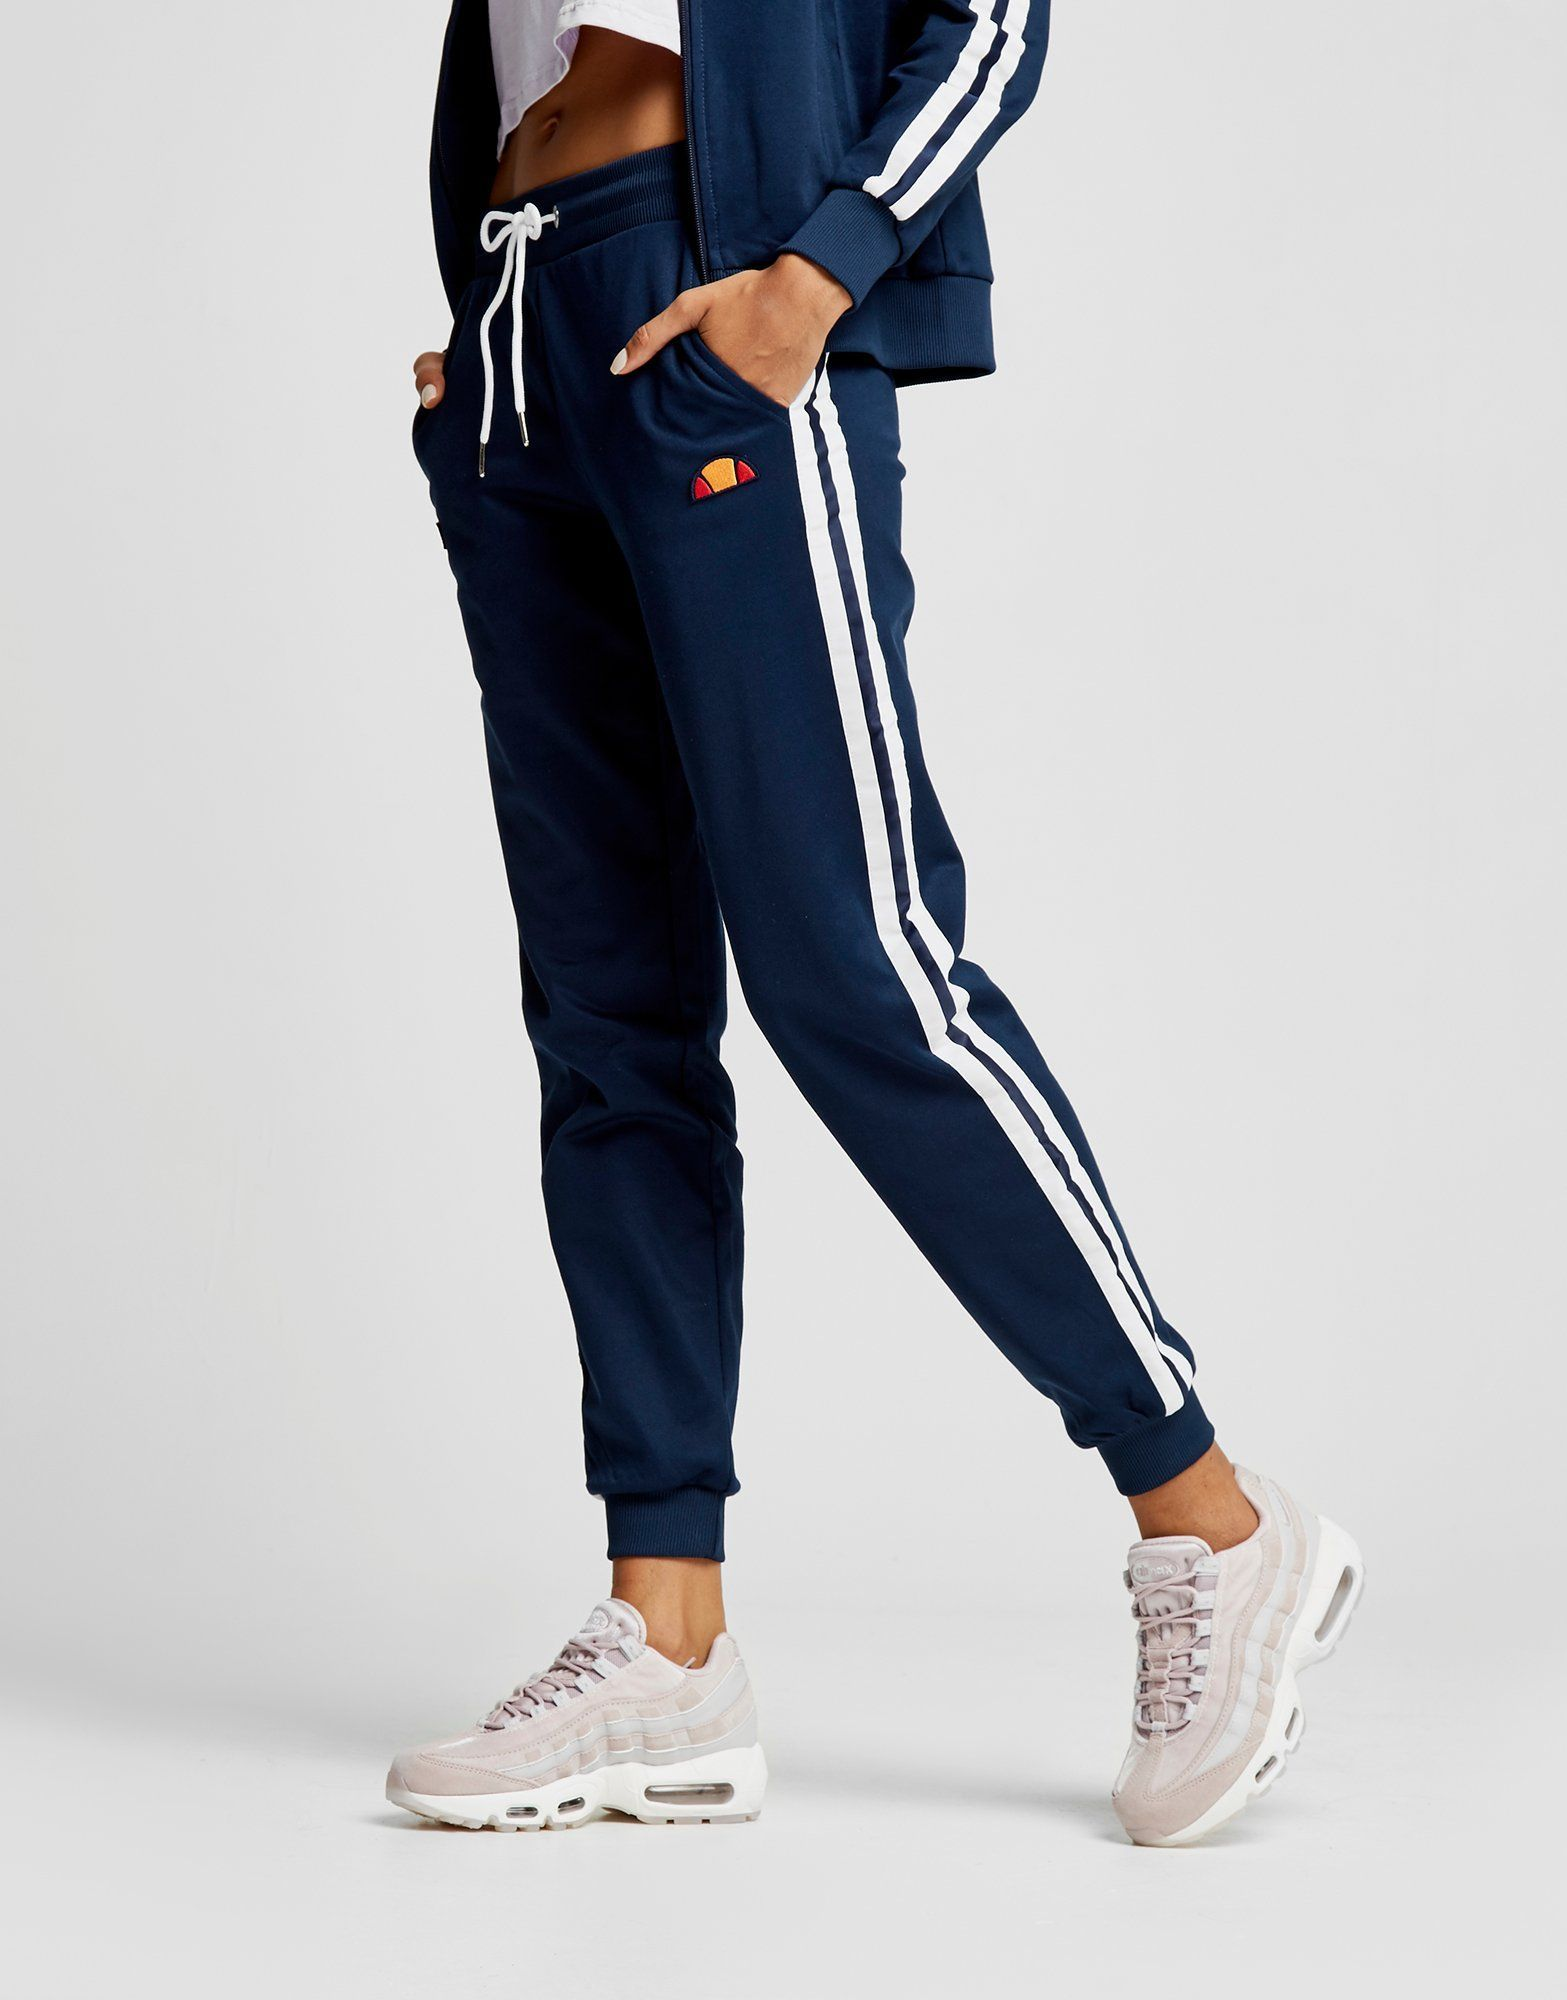 aeb0f62fb945da Ellesse Stripe Tape Pants - Shop online for Ellesse Stripe Tape Pants with  JD Sports, the UK's leading sports fashion retailer.